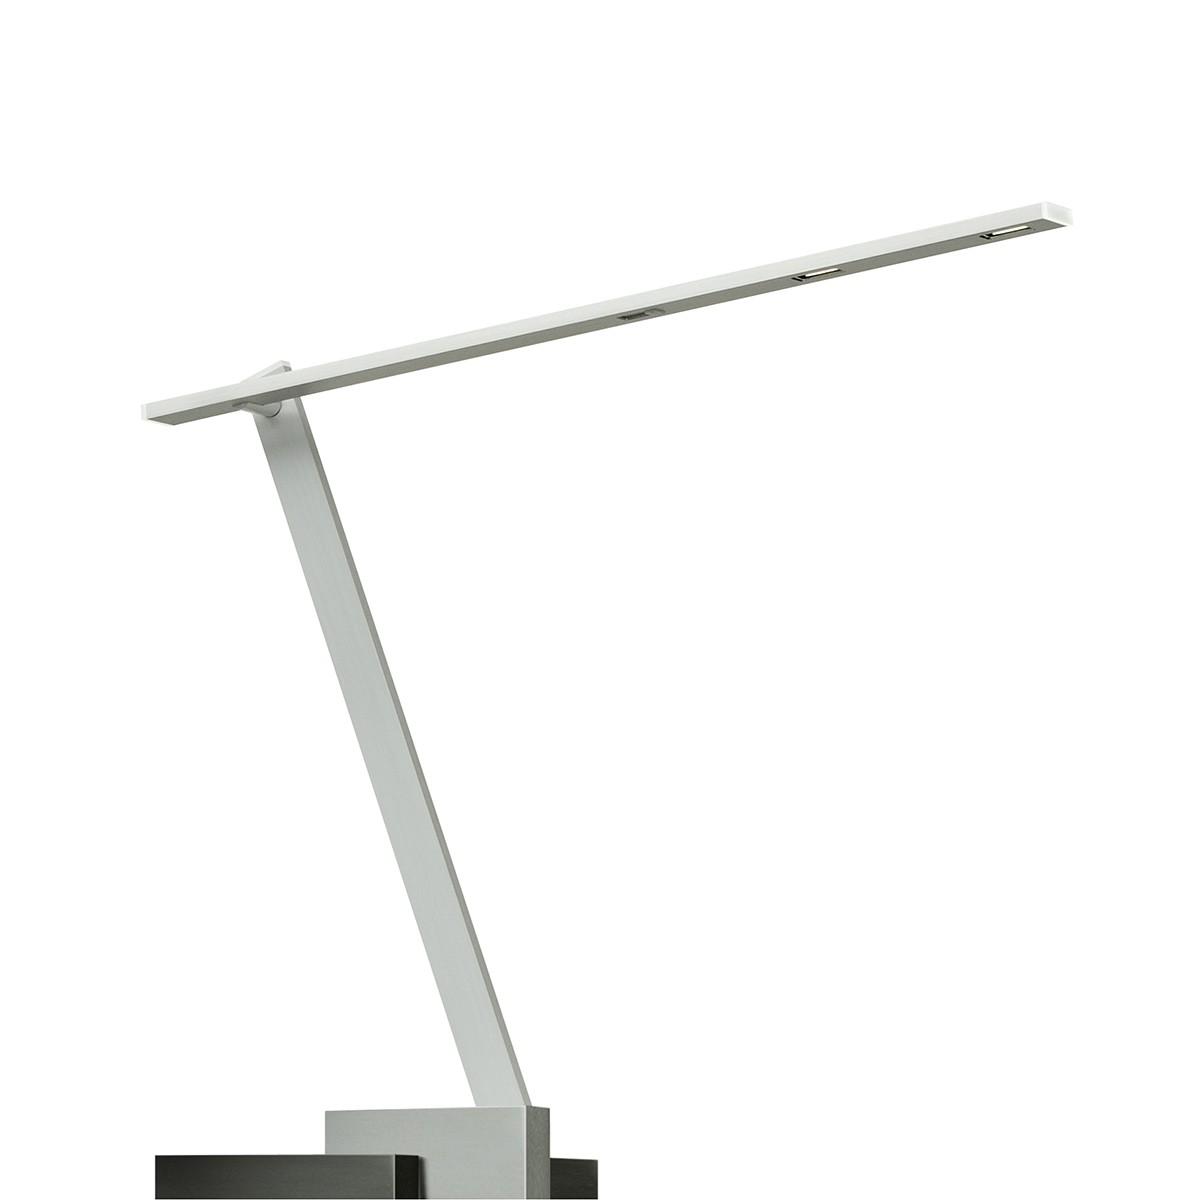 Byok Nastrino Tischleuchte mit Fuss, Aluminium matt